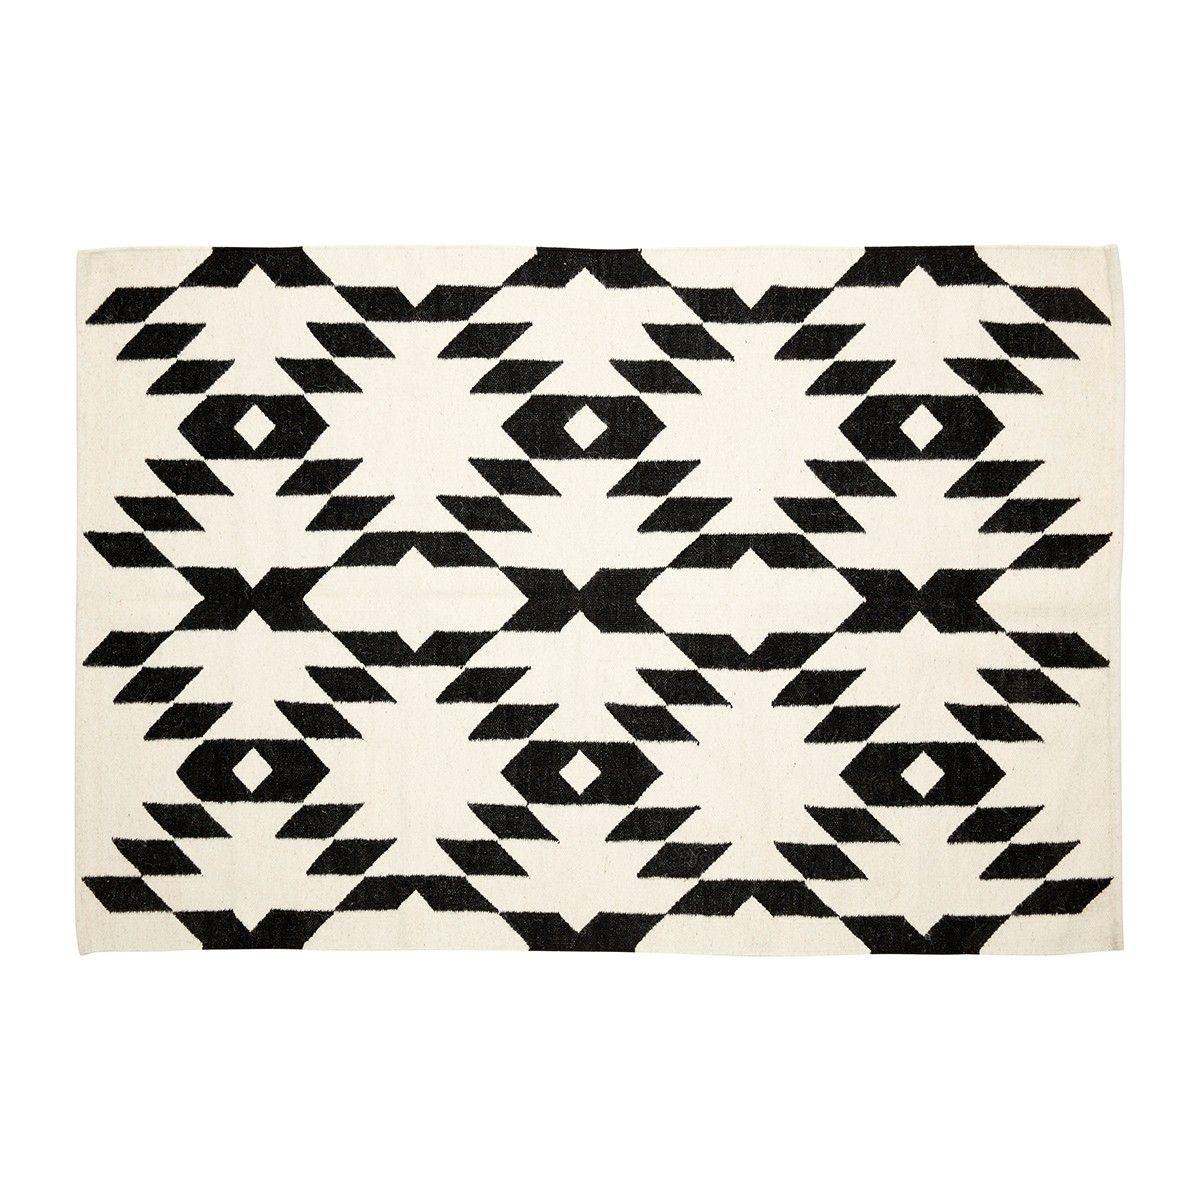 stunning tapis graphique noir et blanc hbsch hubsch with tapis ethnique noir et blanc. Black Bedroom Furniture Sets. Home Design Ideas